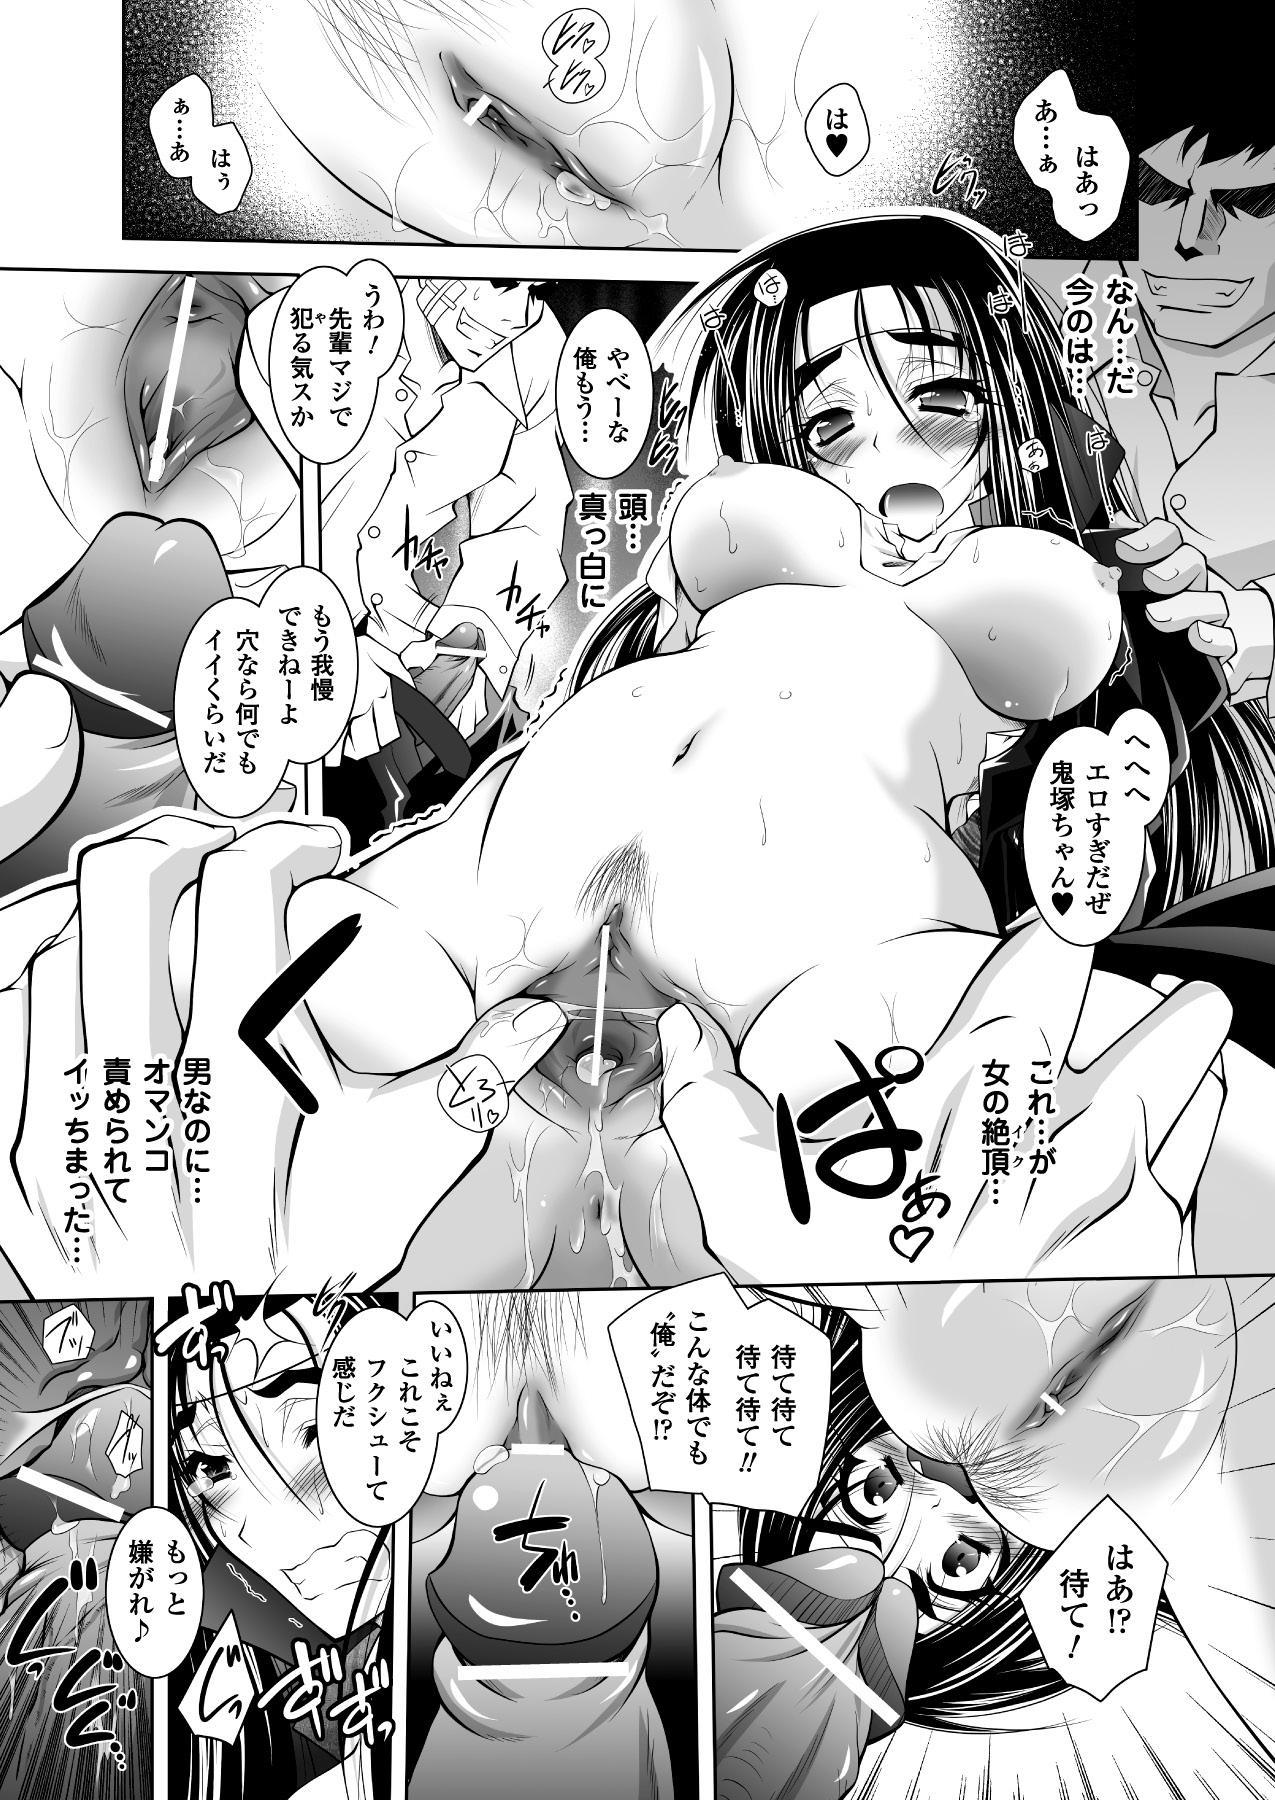 Megami Crisis 10 126